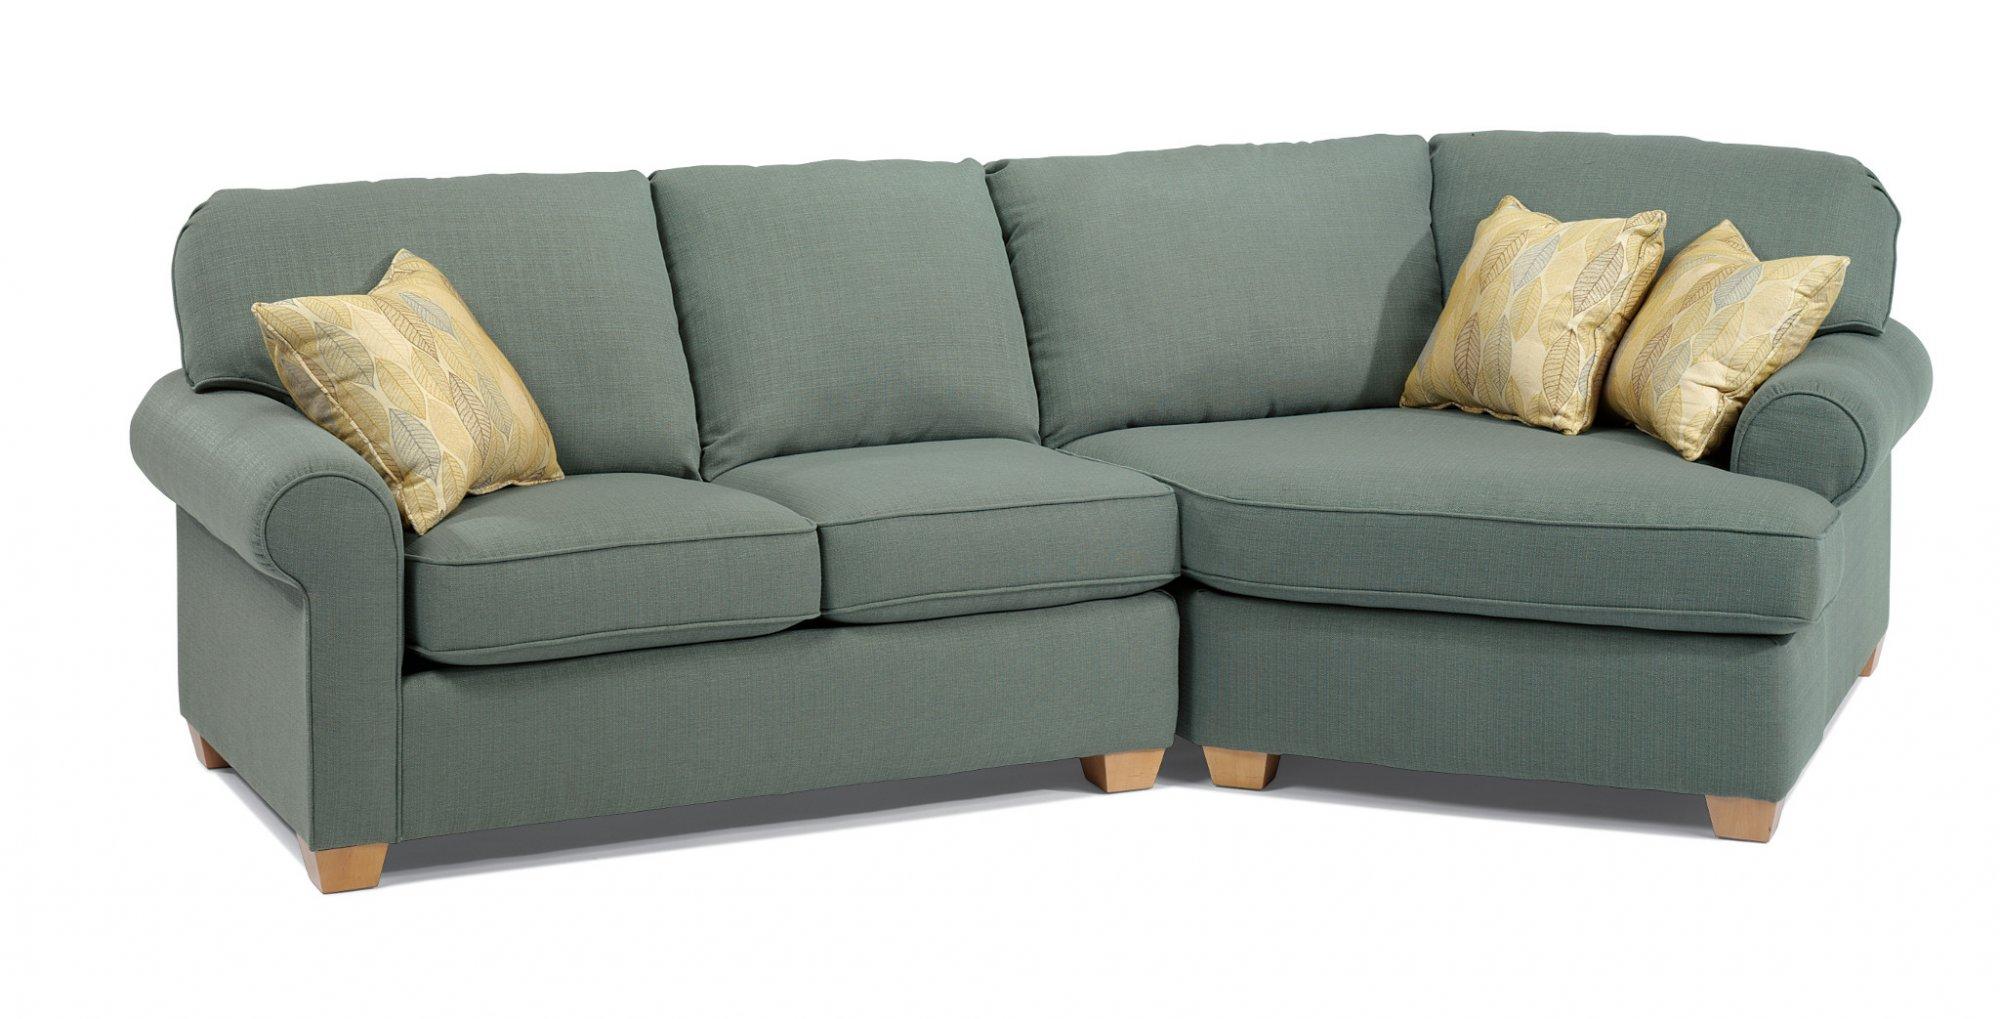 Magnificent Flexsteel 5535 31 Thornton Fabric Sofa Reese Warehouse Creativecarmelina Interior Chair Design Creativecarmelinacom